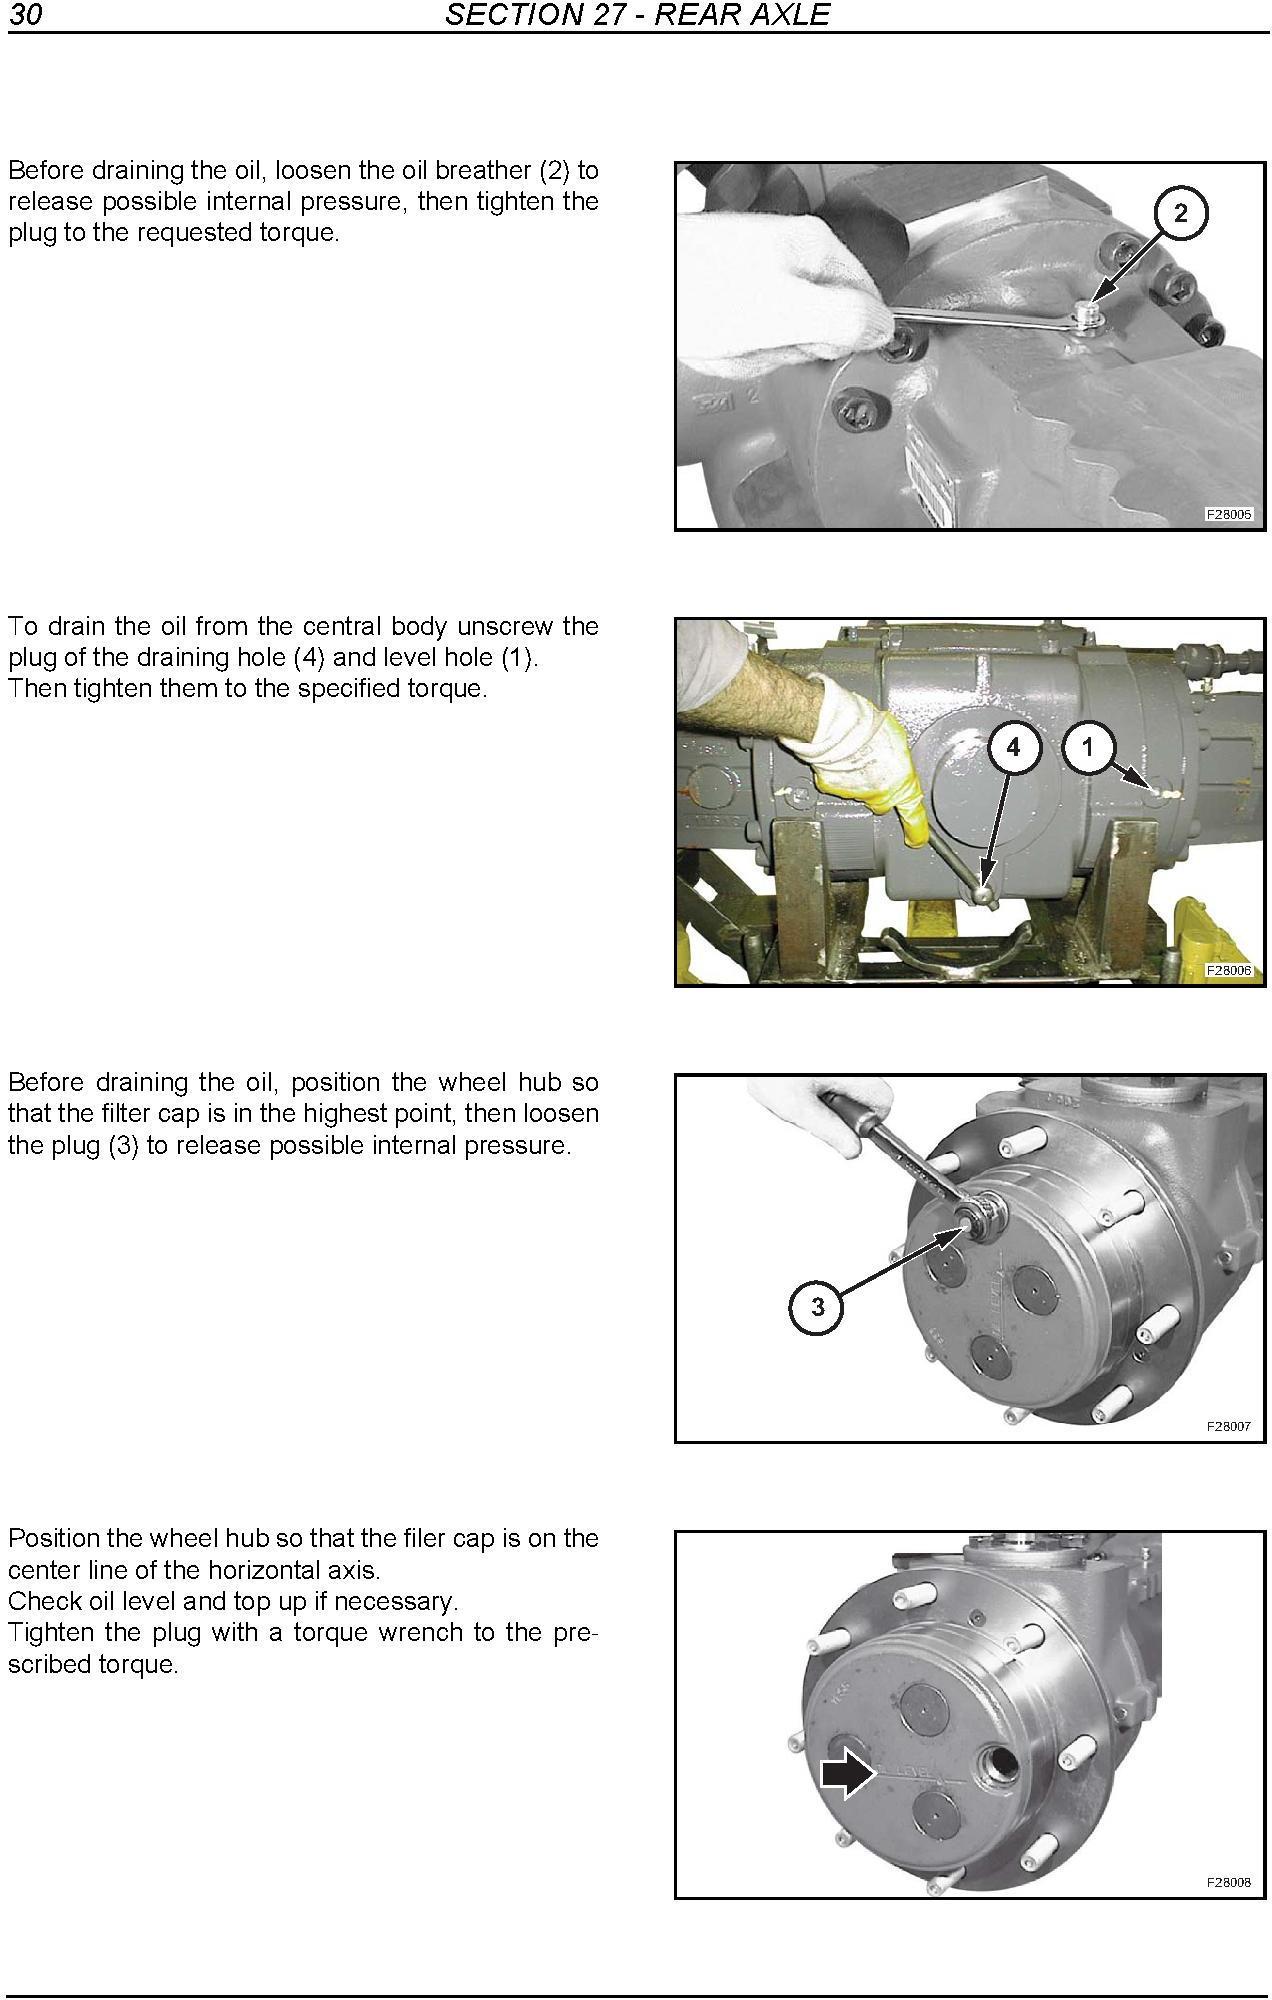 New Holland B110, B115 Tier 3 Loader Backhoe Service Manual - 3